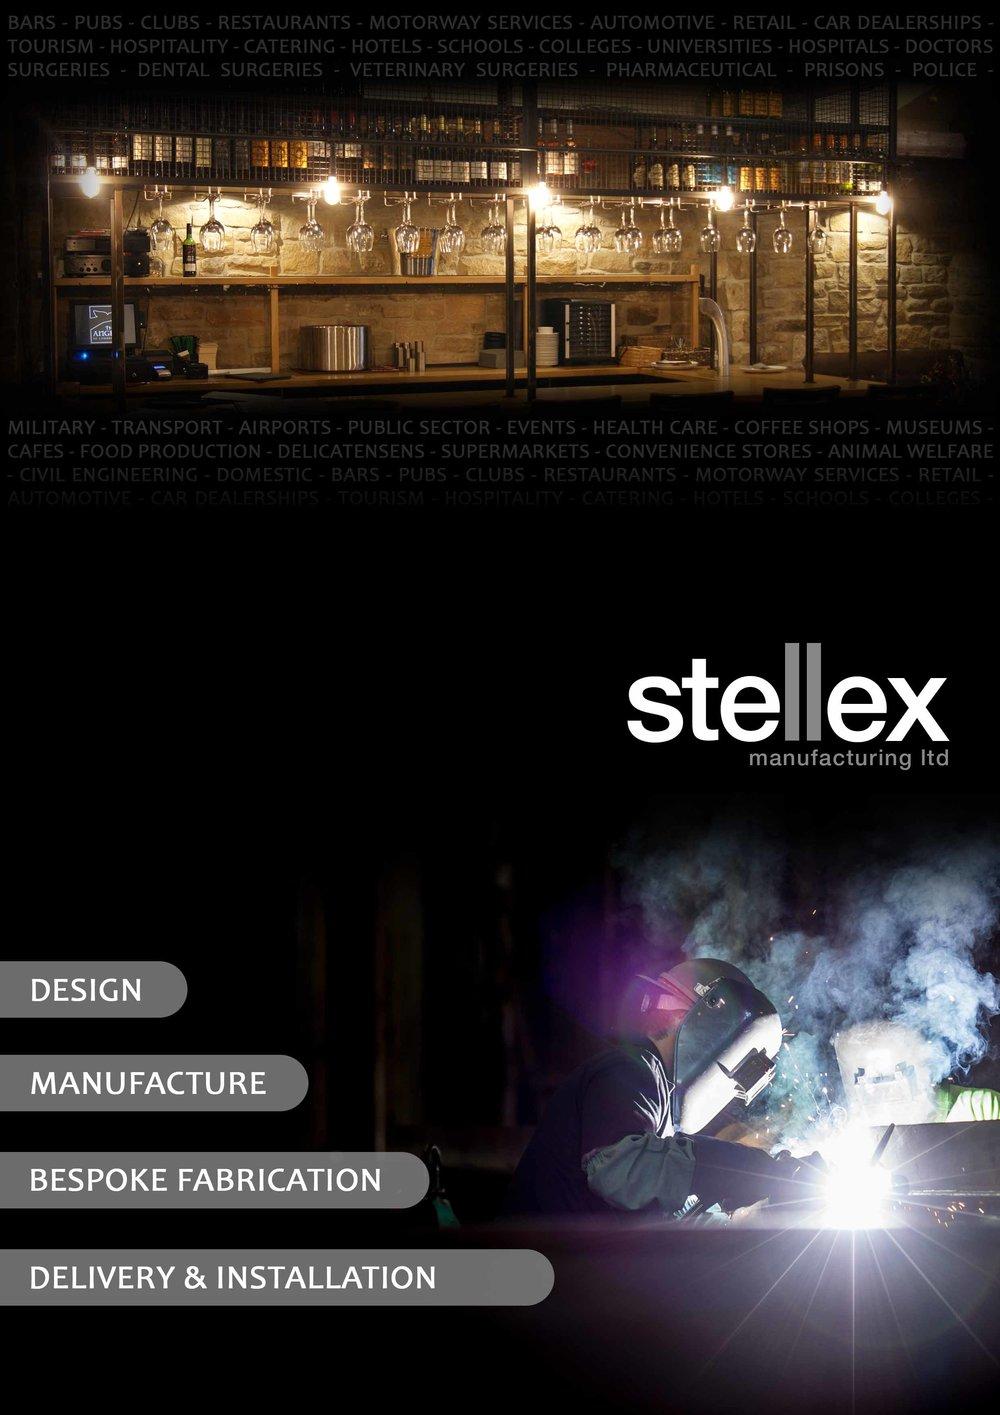 1 Stellex Cover.jpg